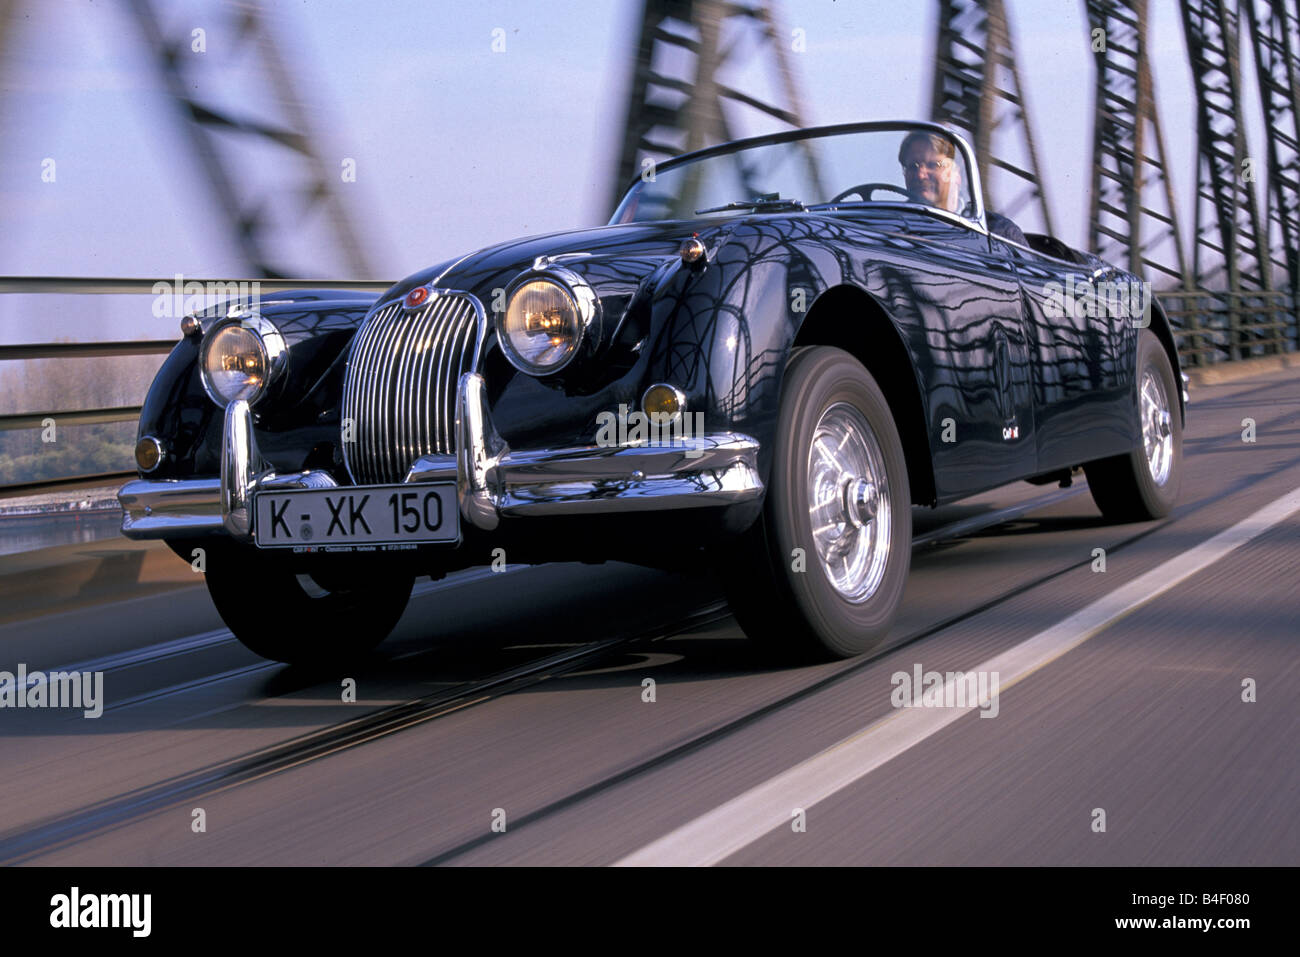 Car, Jaguar XK 150, vintage car, black, 1950s, fifties, convertible, convertible top, open,  driving, diagonal front, - Stock Image